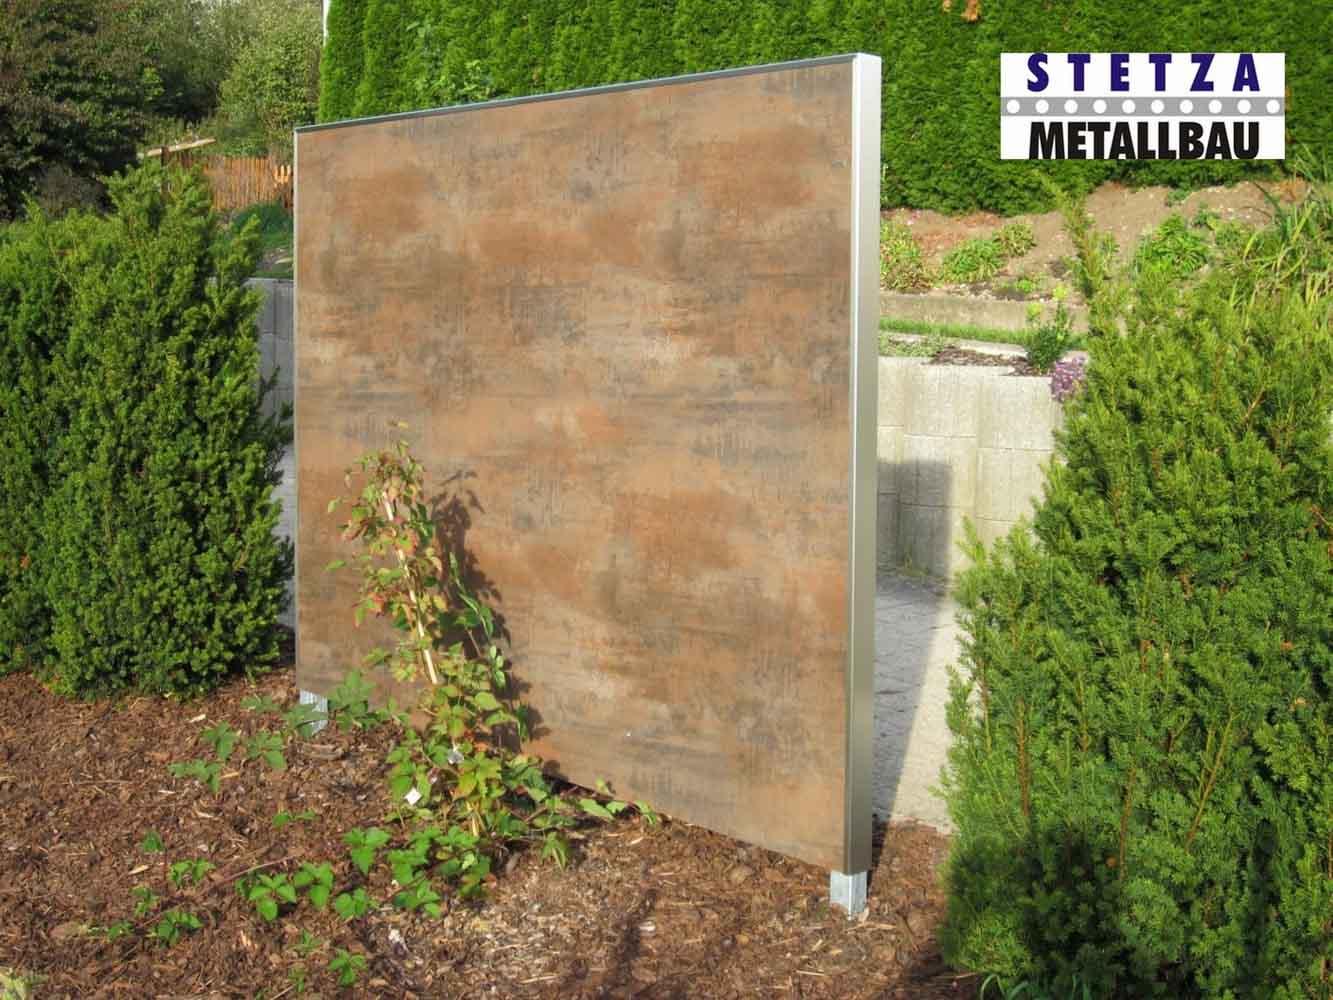 Gartengestaltung 0007 stetza metallbau de for Gartengestaltung 2016